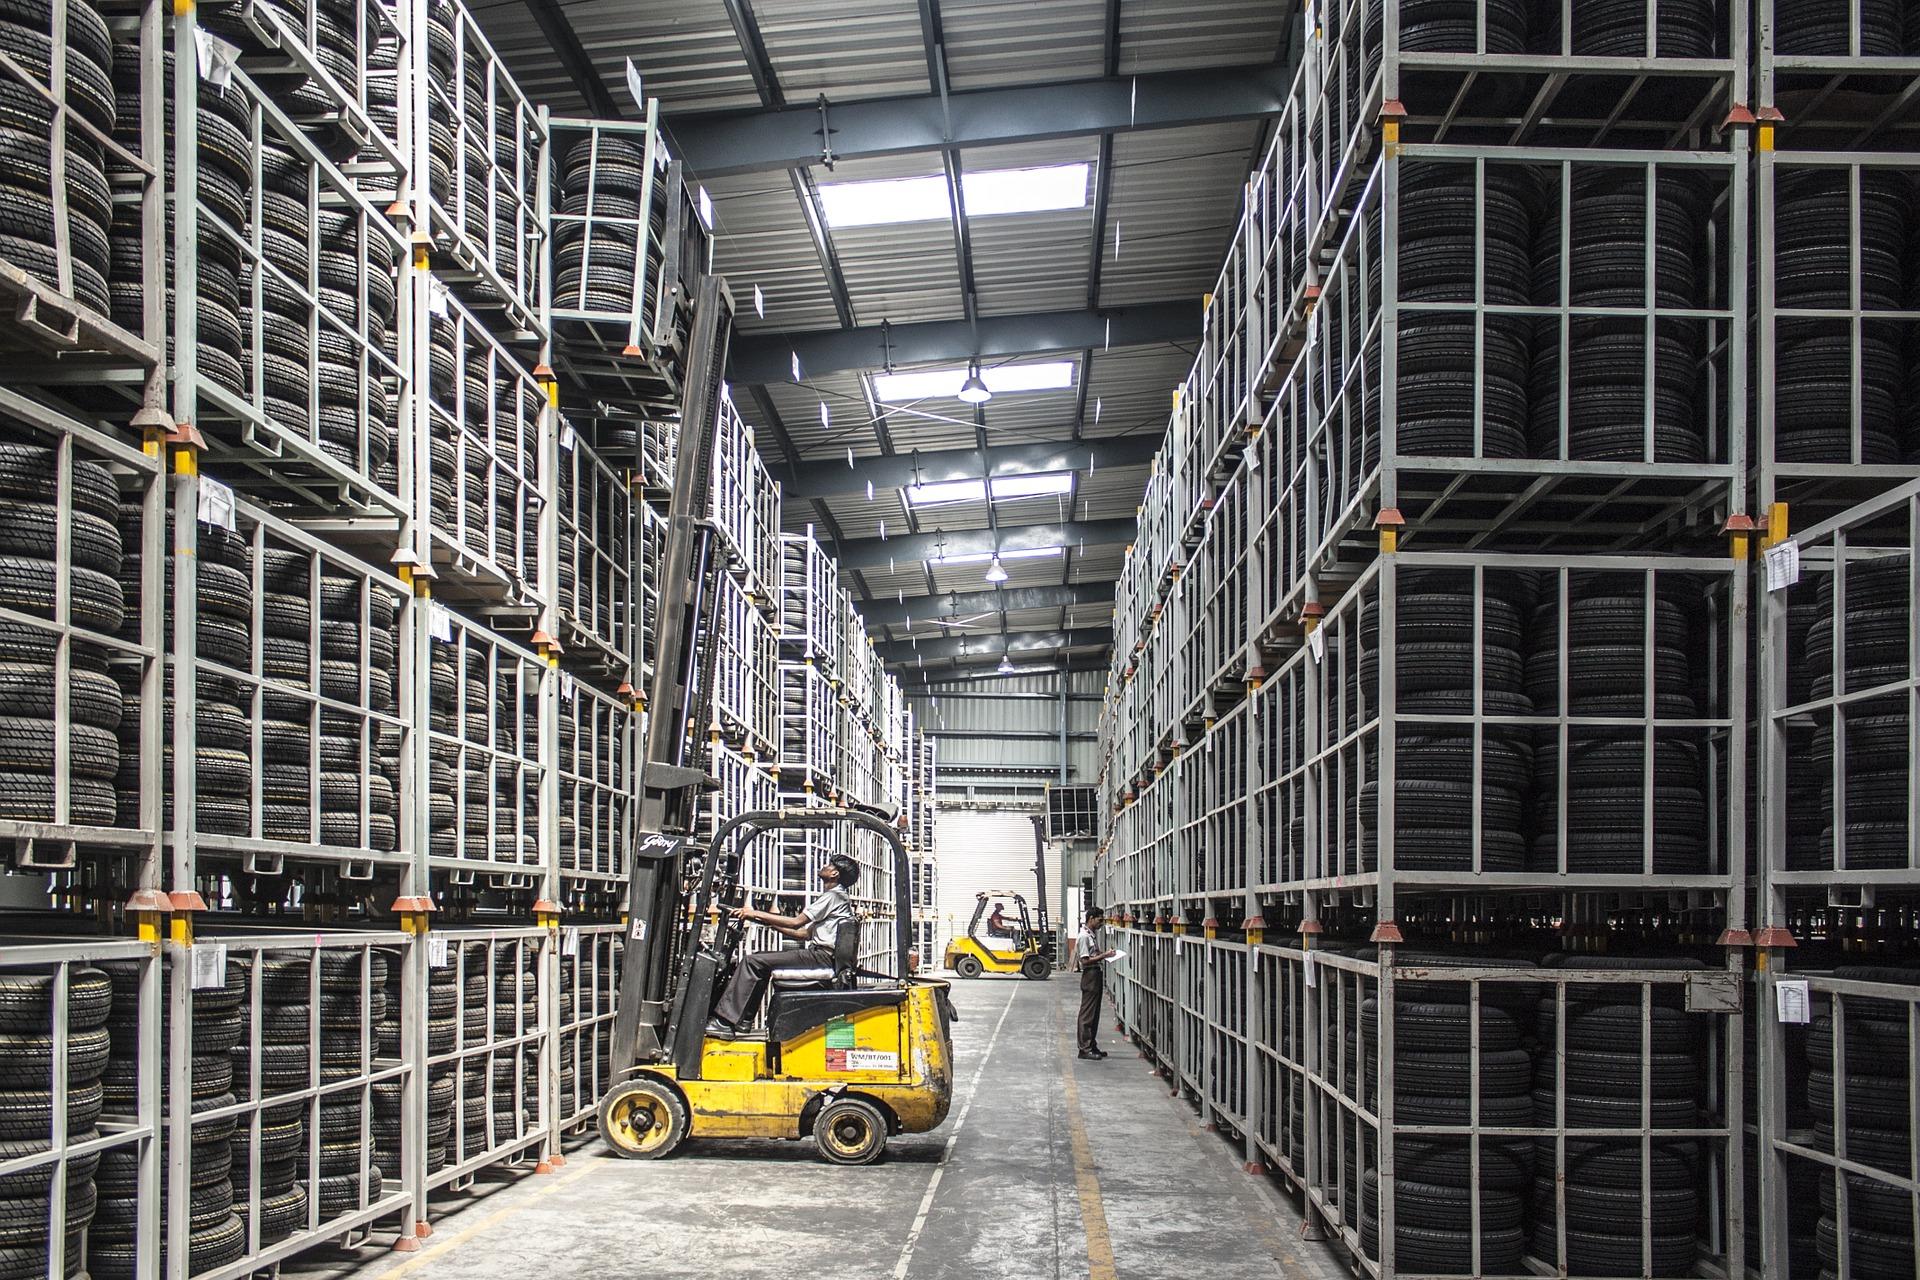 20170321-warehouse.jpg